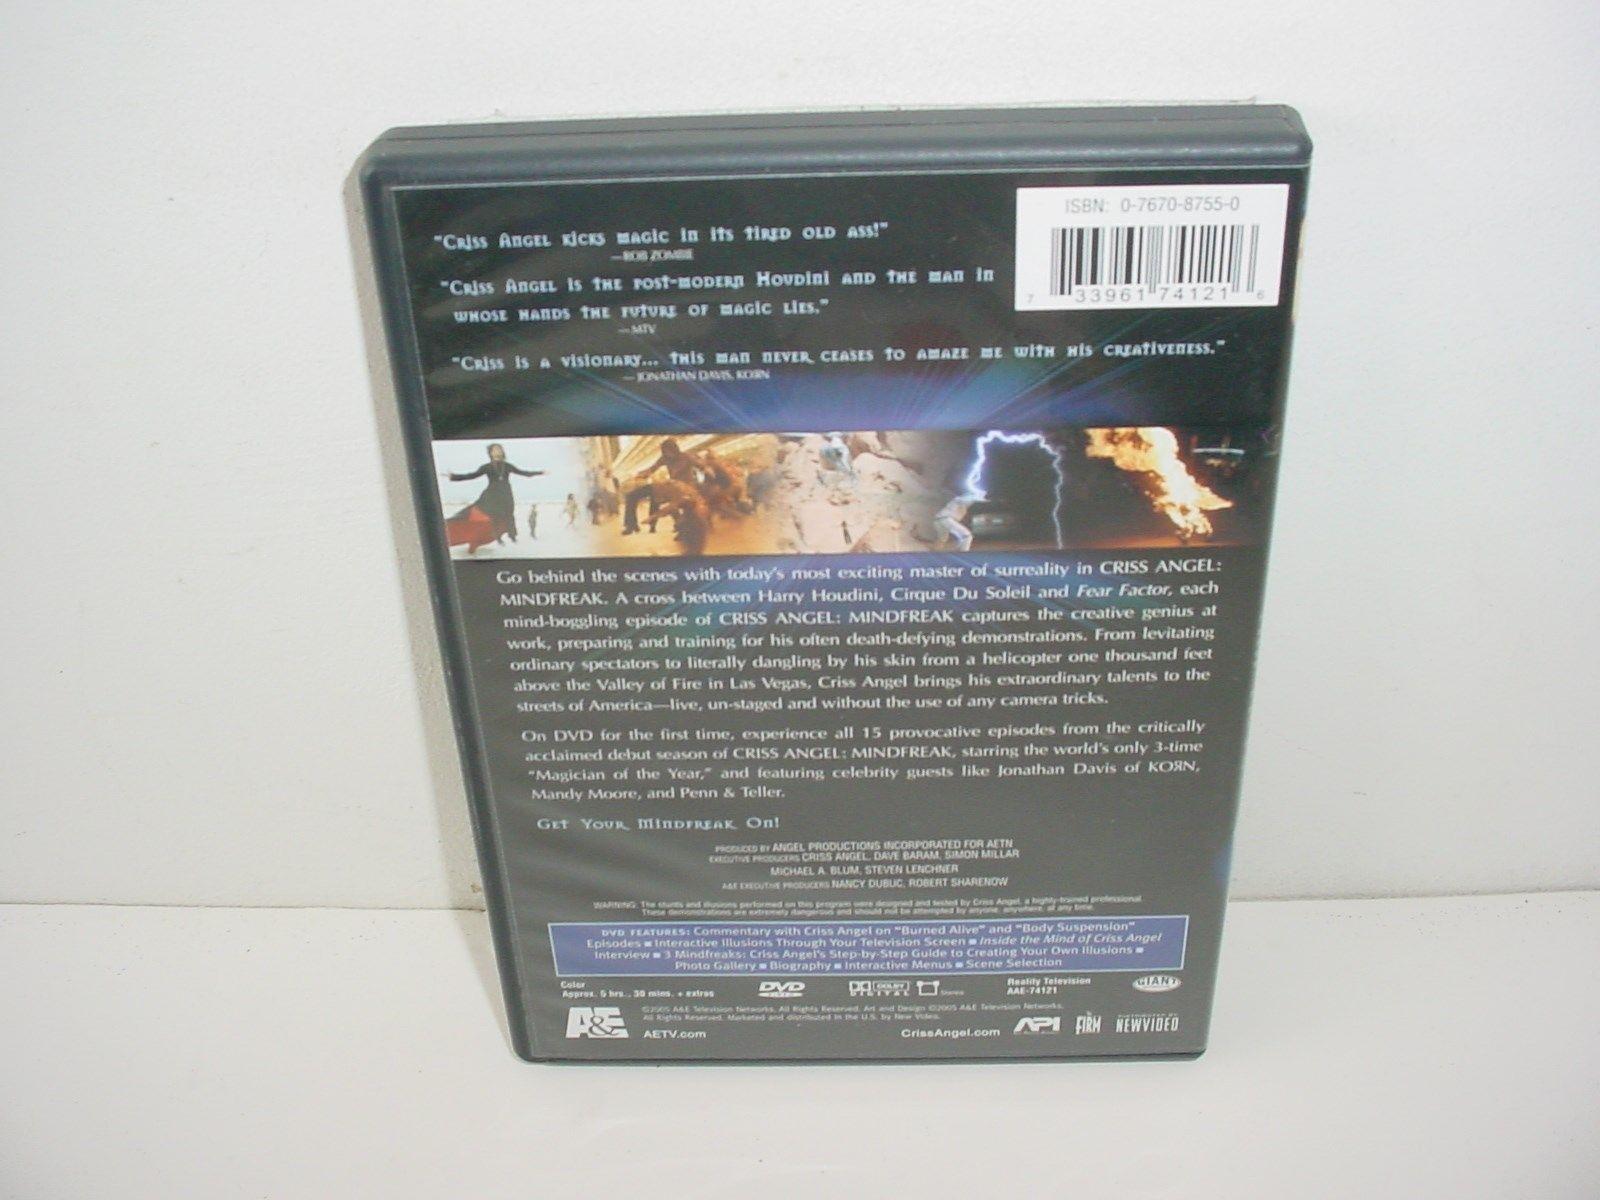 Criss Angel MindFreak The Complete Season One DVD